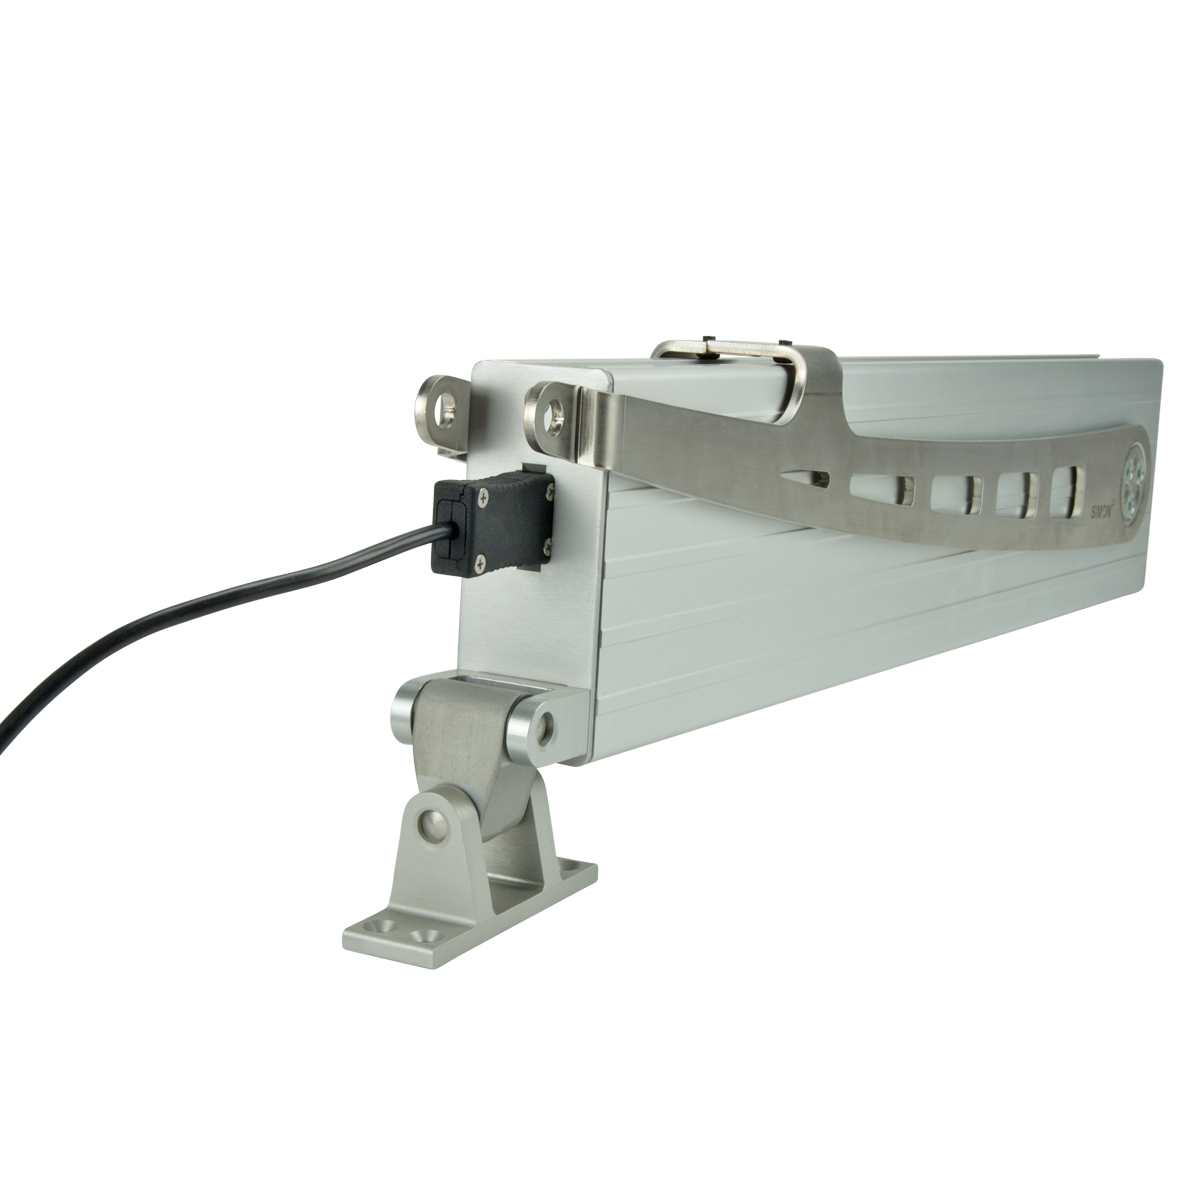 SICO USB-110